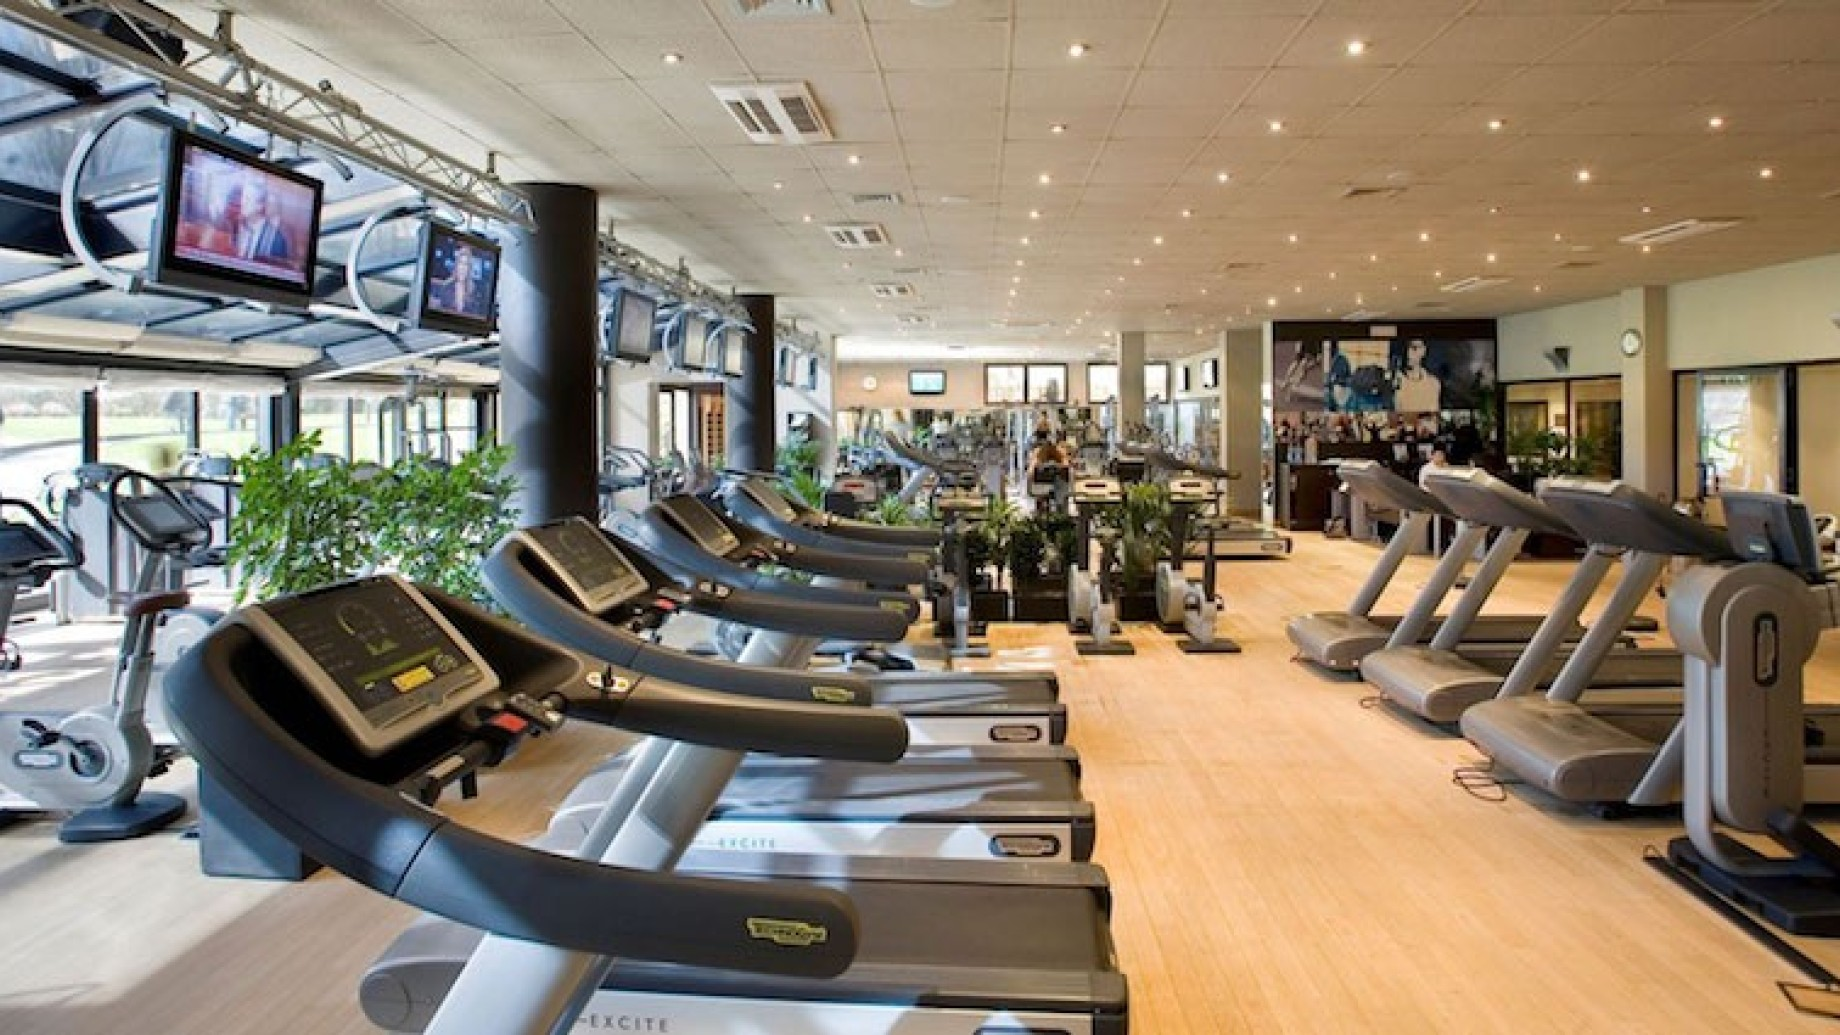 fitness-room_aspria-top-palestra